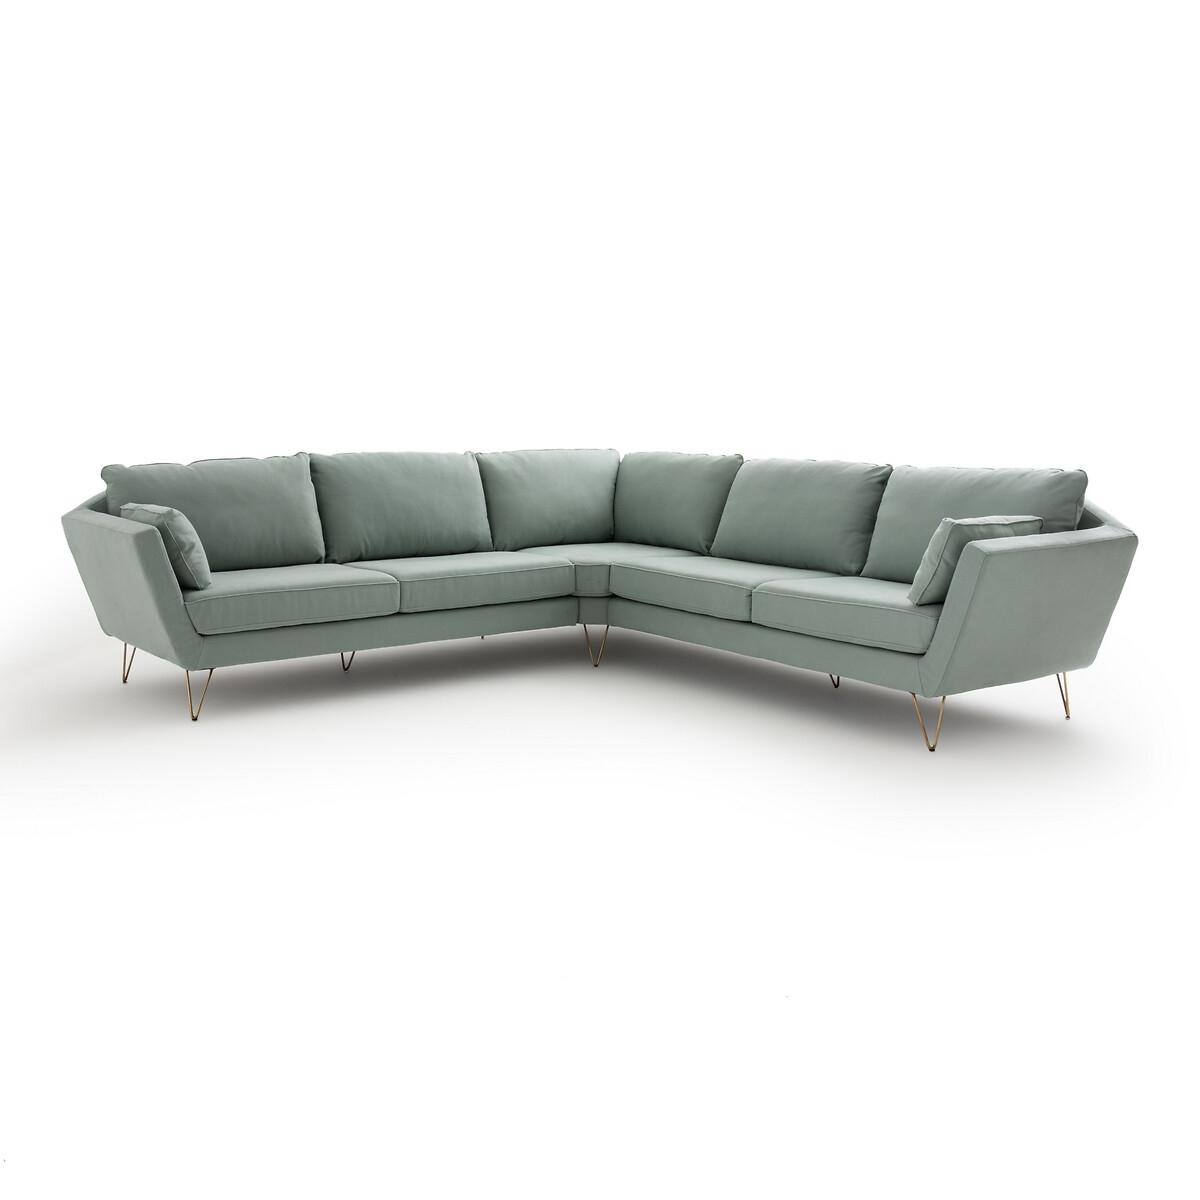 Canapé d'angle XXL coton/lin, Topim